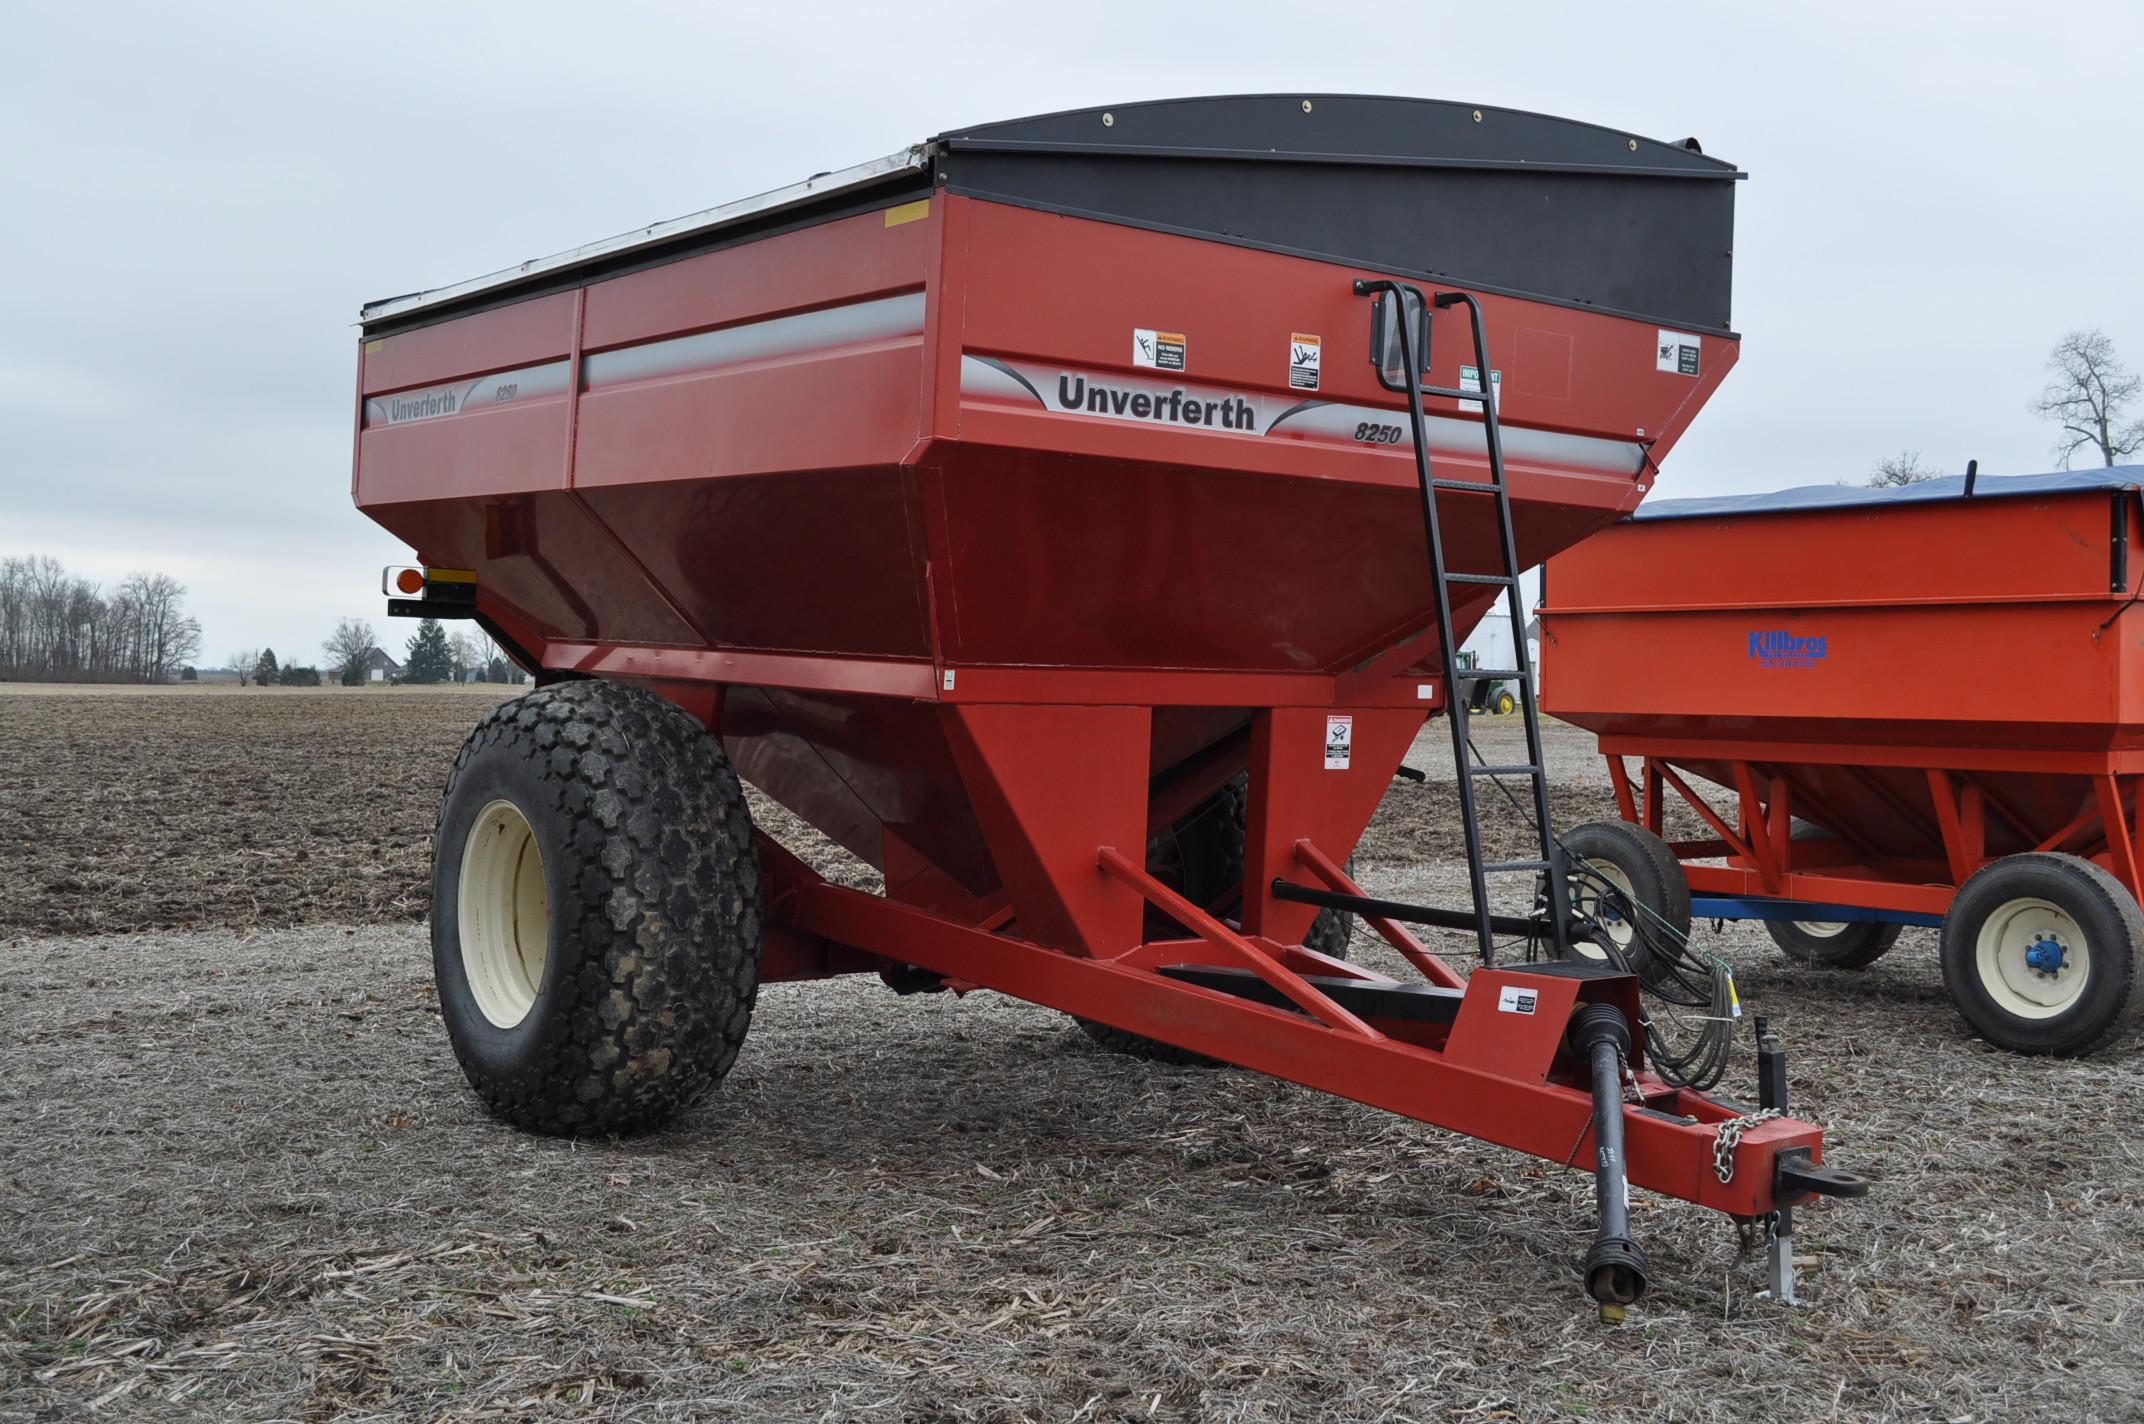 Unverferth 8250 grain cart, corner auger, 30.5L-32 diamond tread tires, lights, roll tarp, hyd - Image 4 of 11